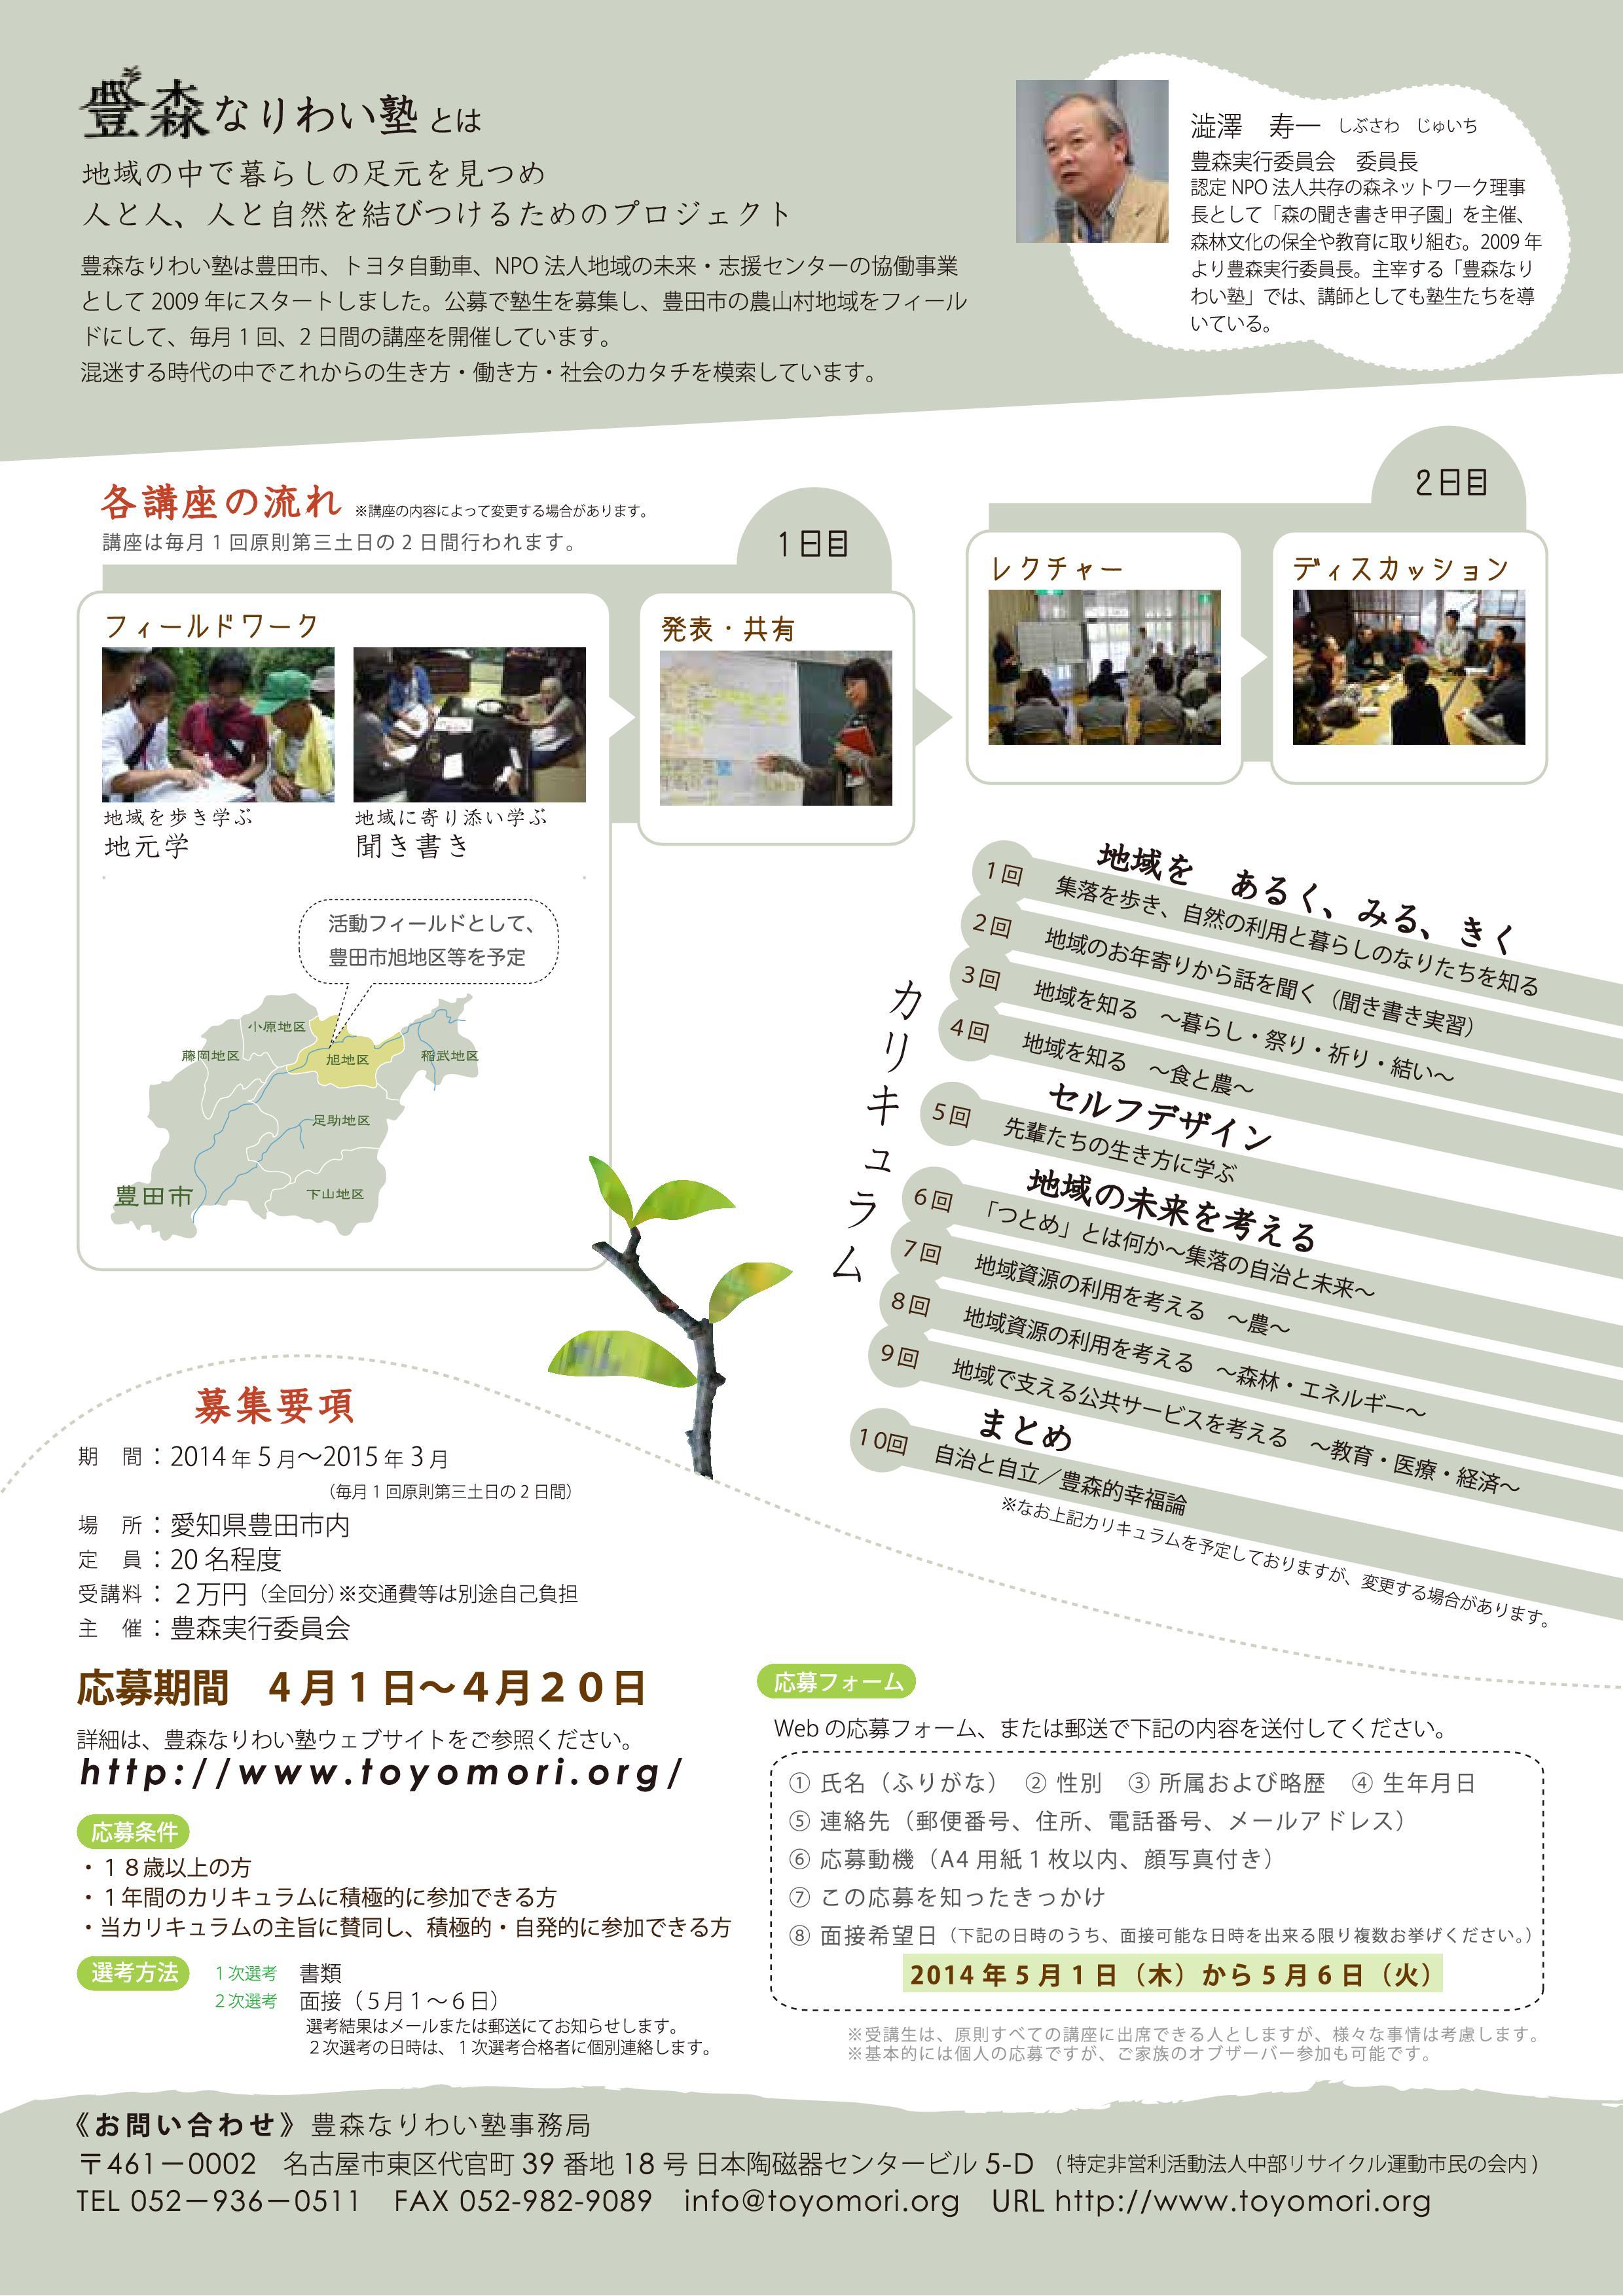 www.toyomori.org_staffbl...014_03_13_toyomori4-002